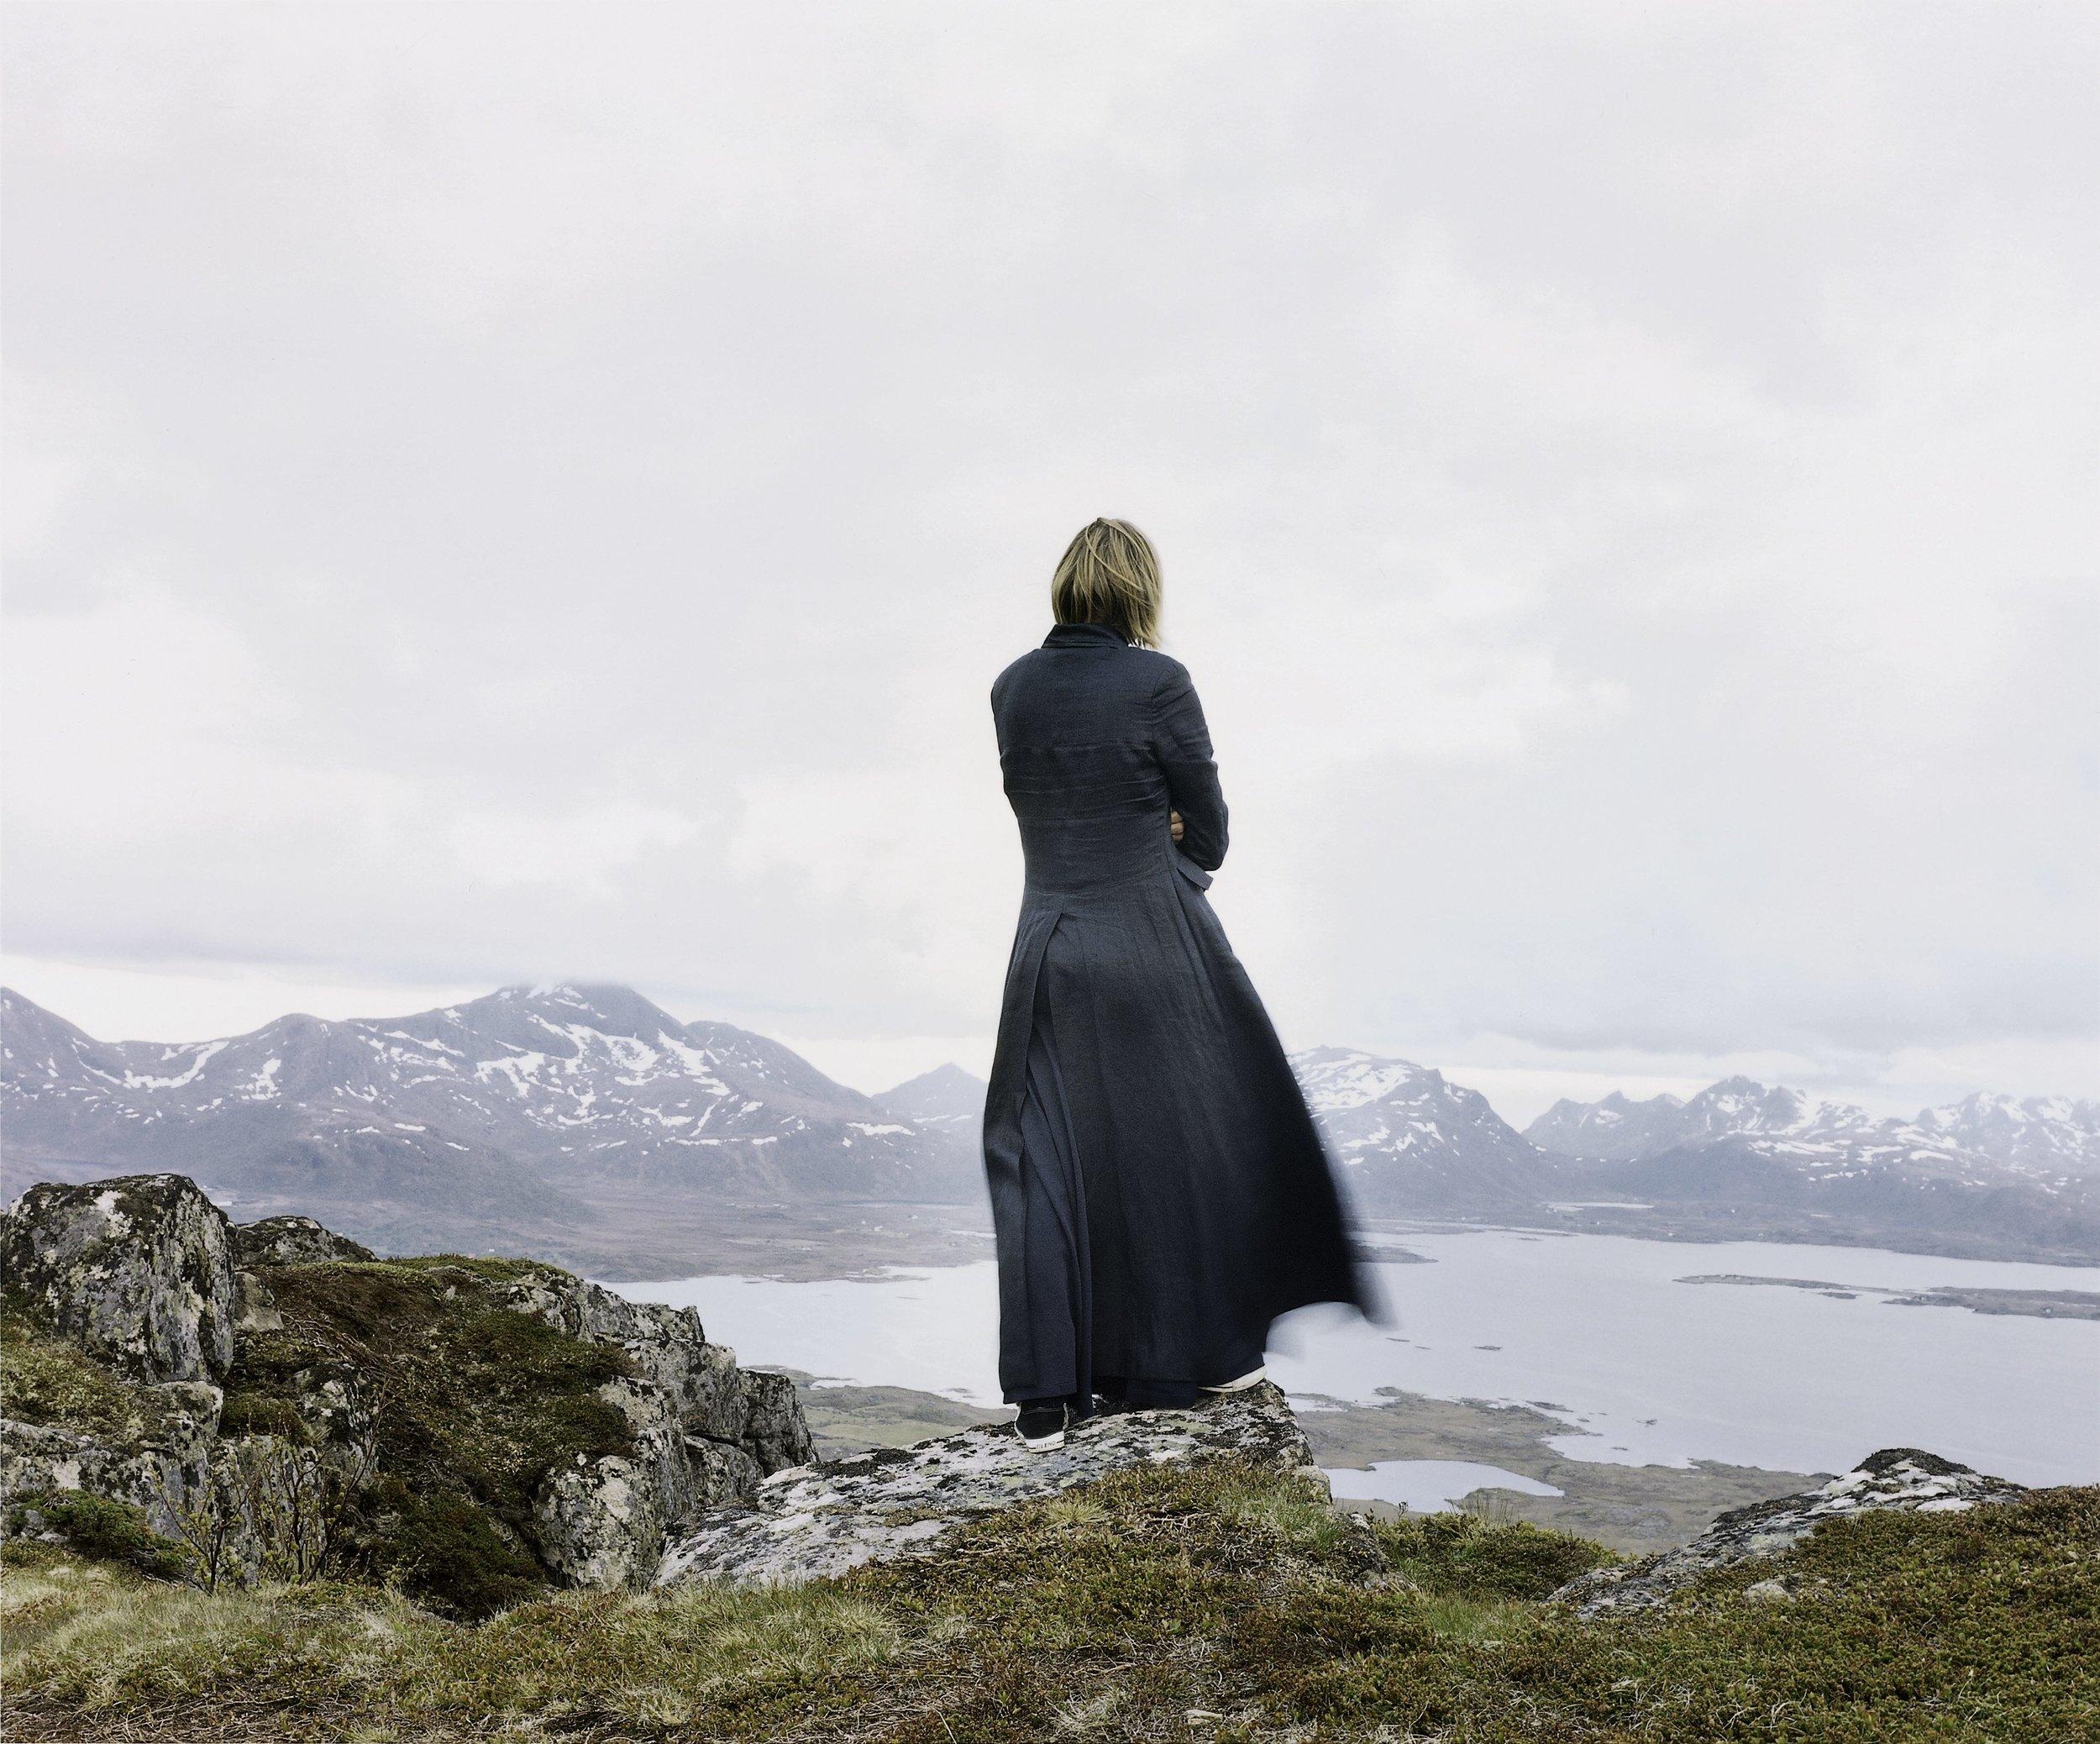 Der Wanderer 2,  Elina Brotherus, 2004